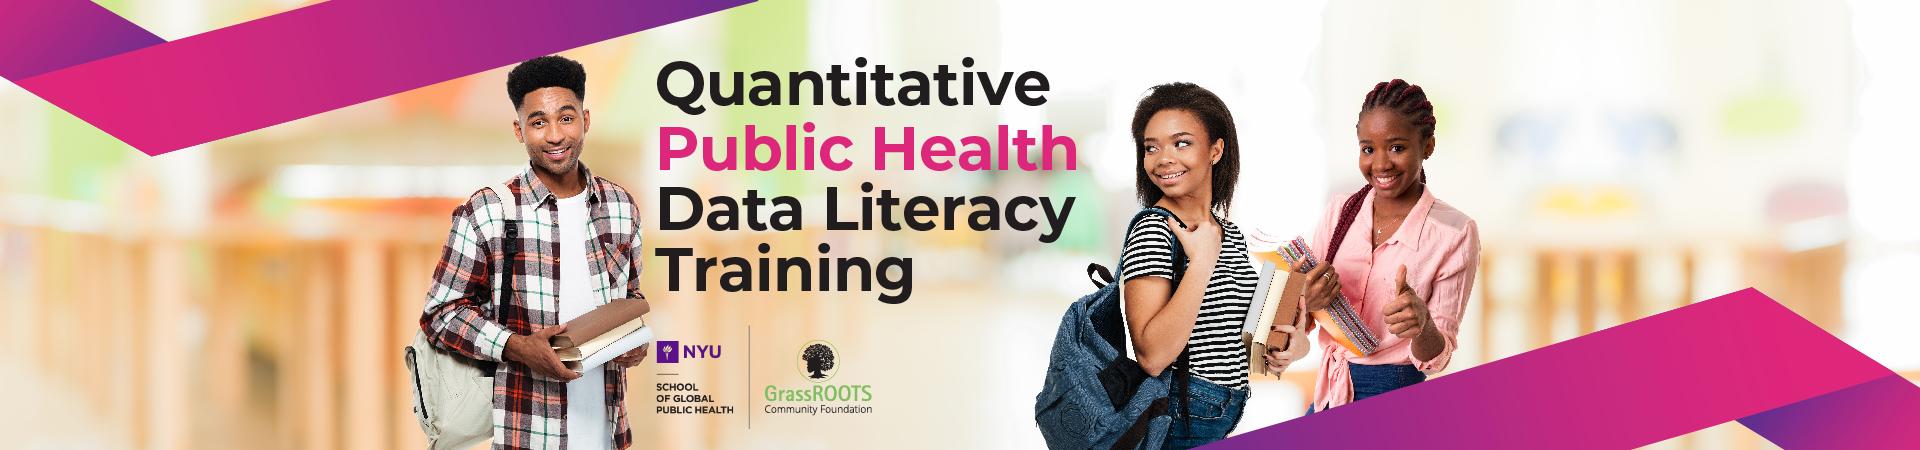 Data literacy training slide